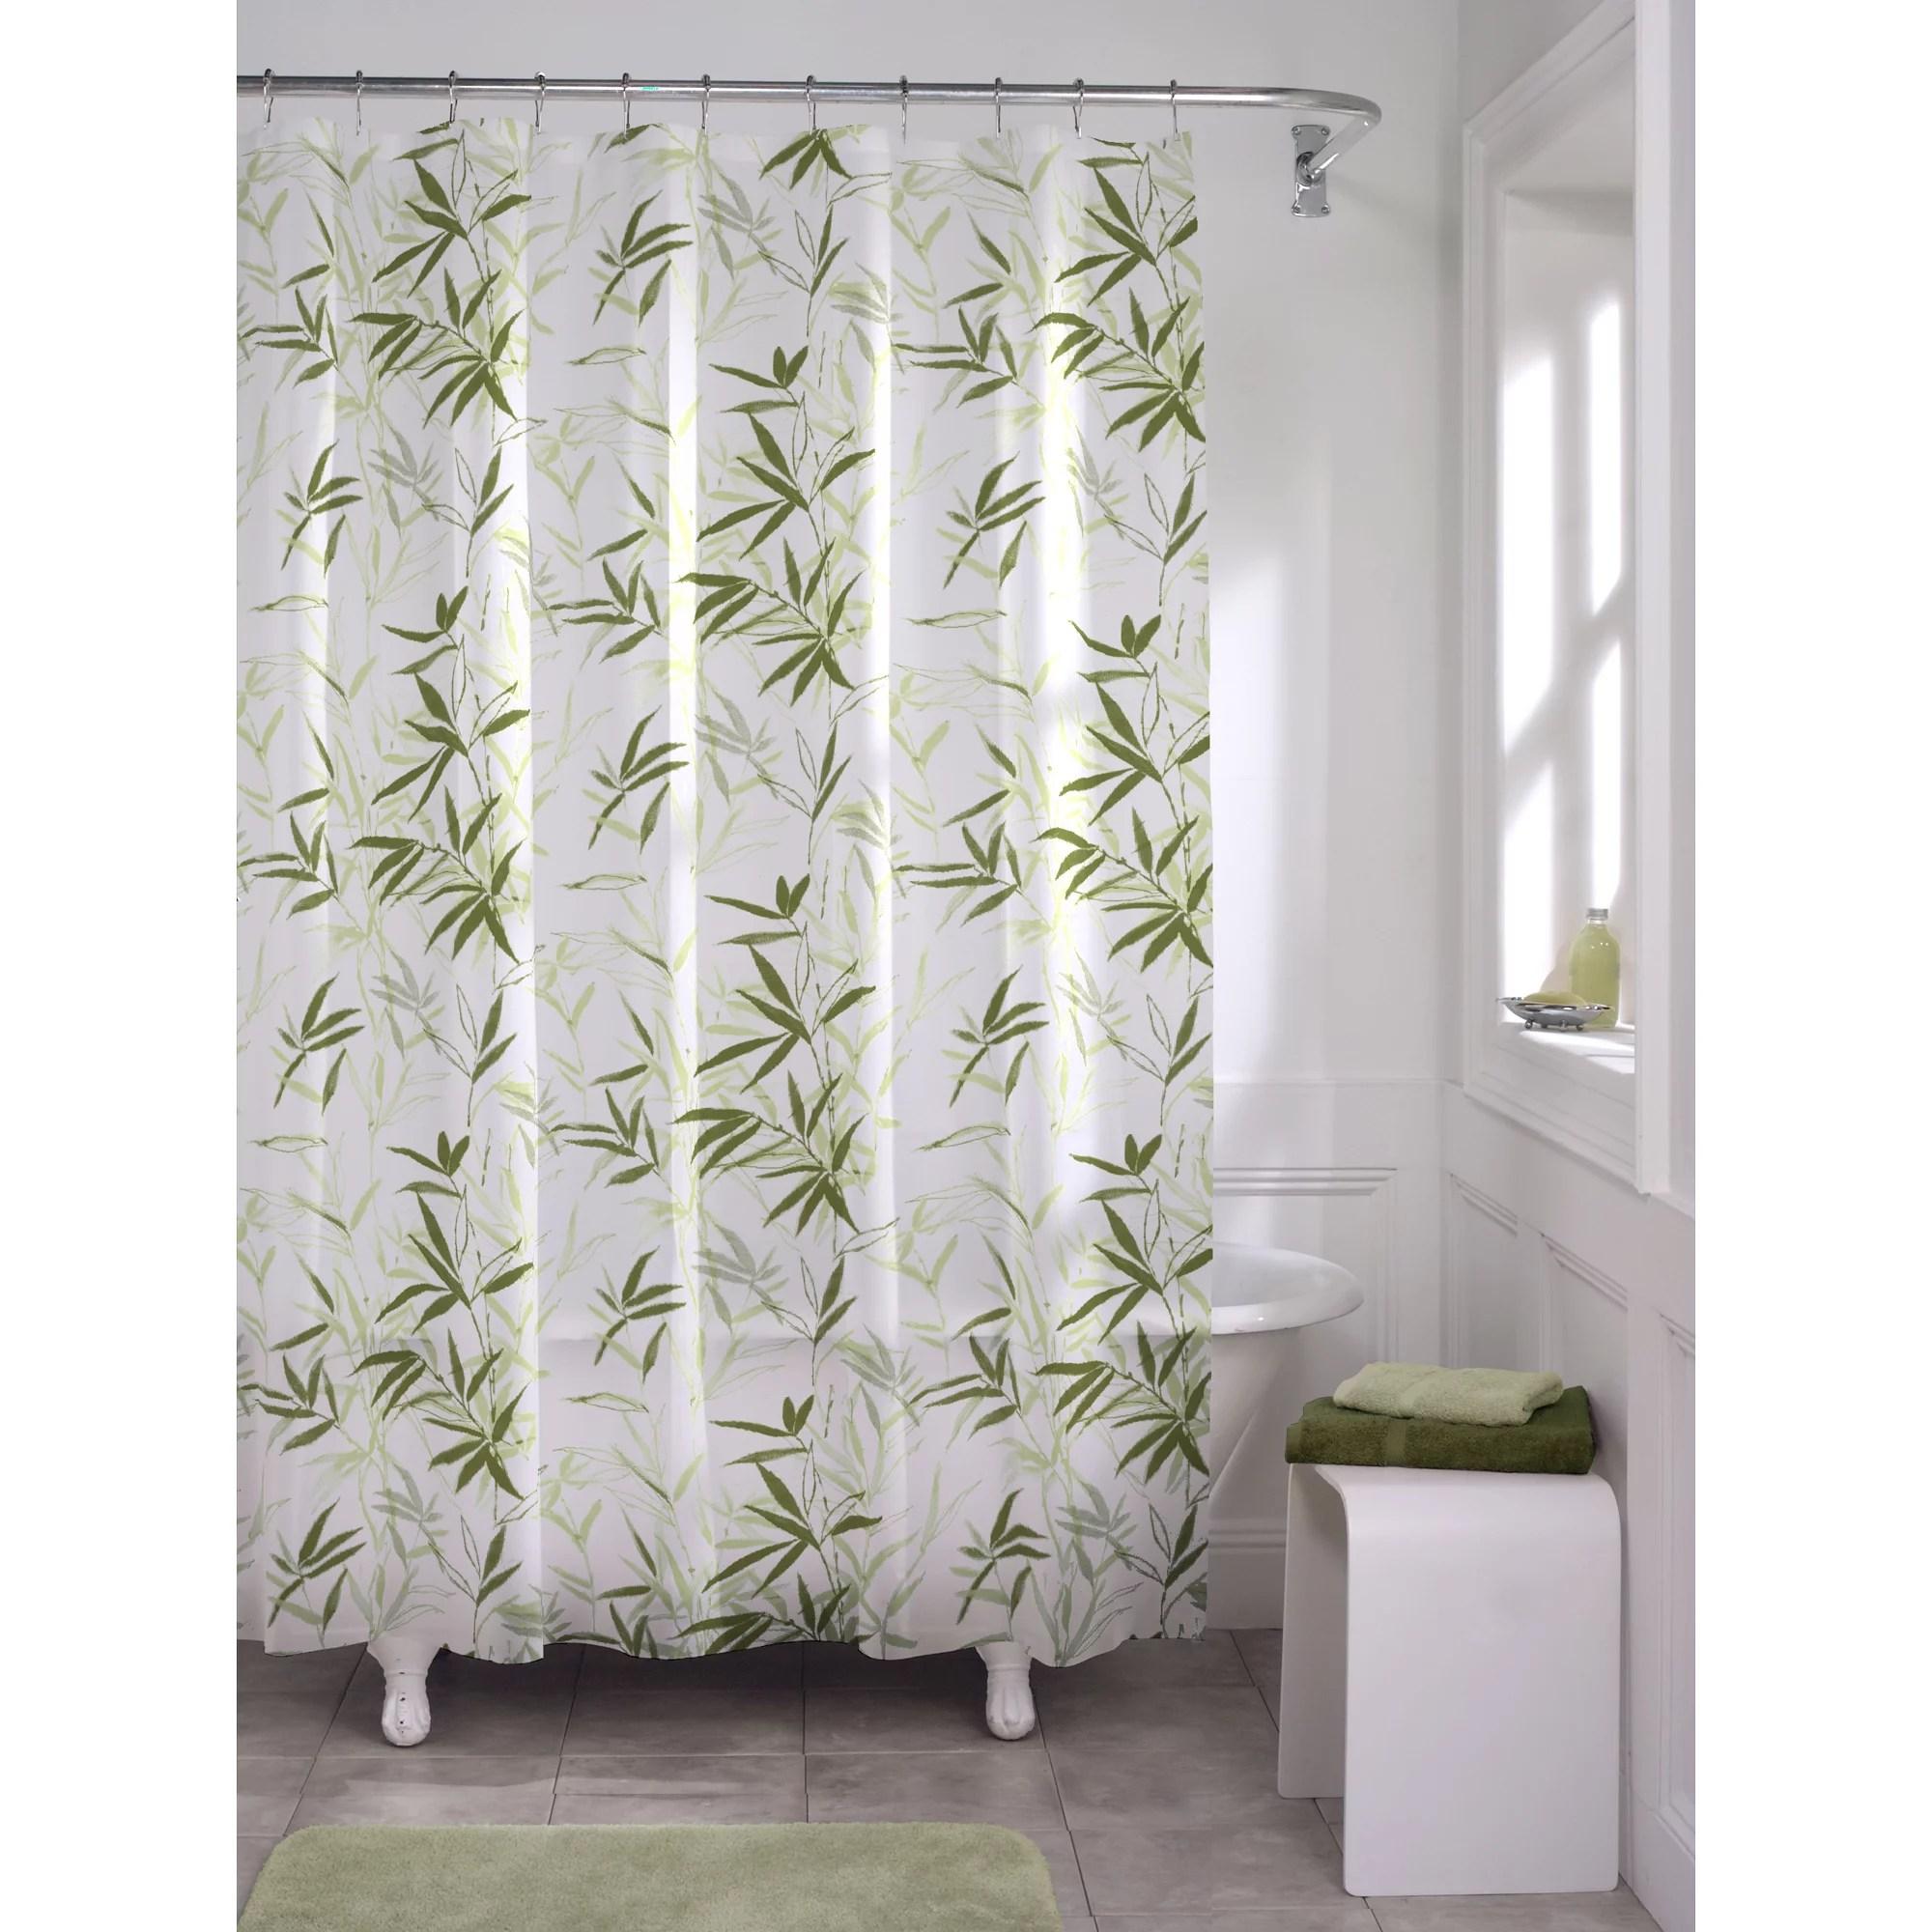 maytex zen garden peva vinyl shower curtain green 70 x 72 walmart com